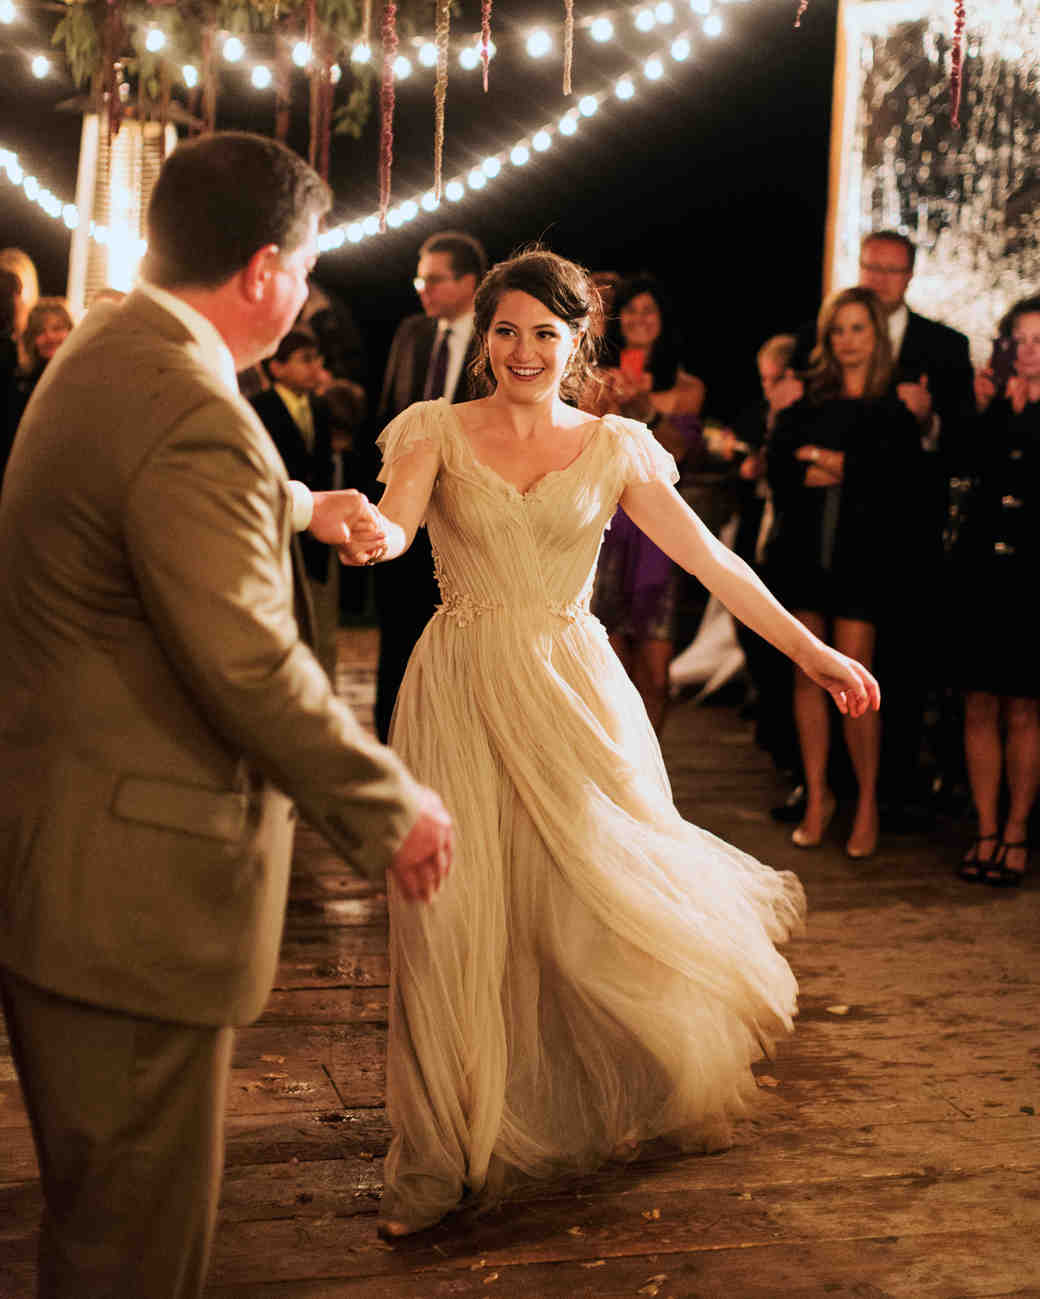 sara-matt-wedding-daddance-3717-s111990-0715.jpg